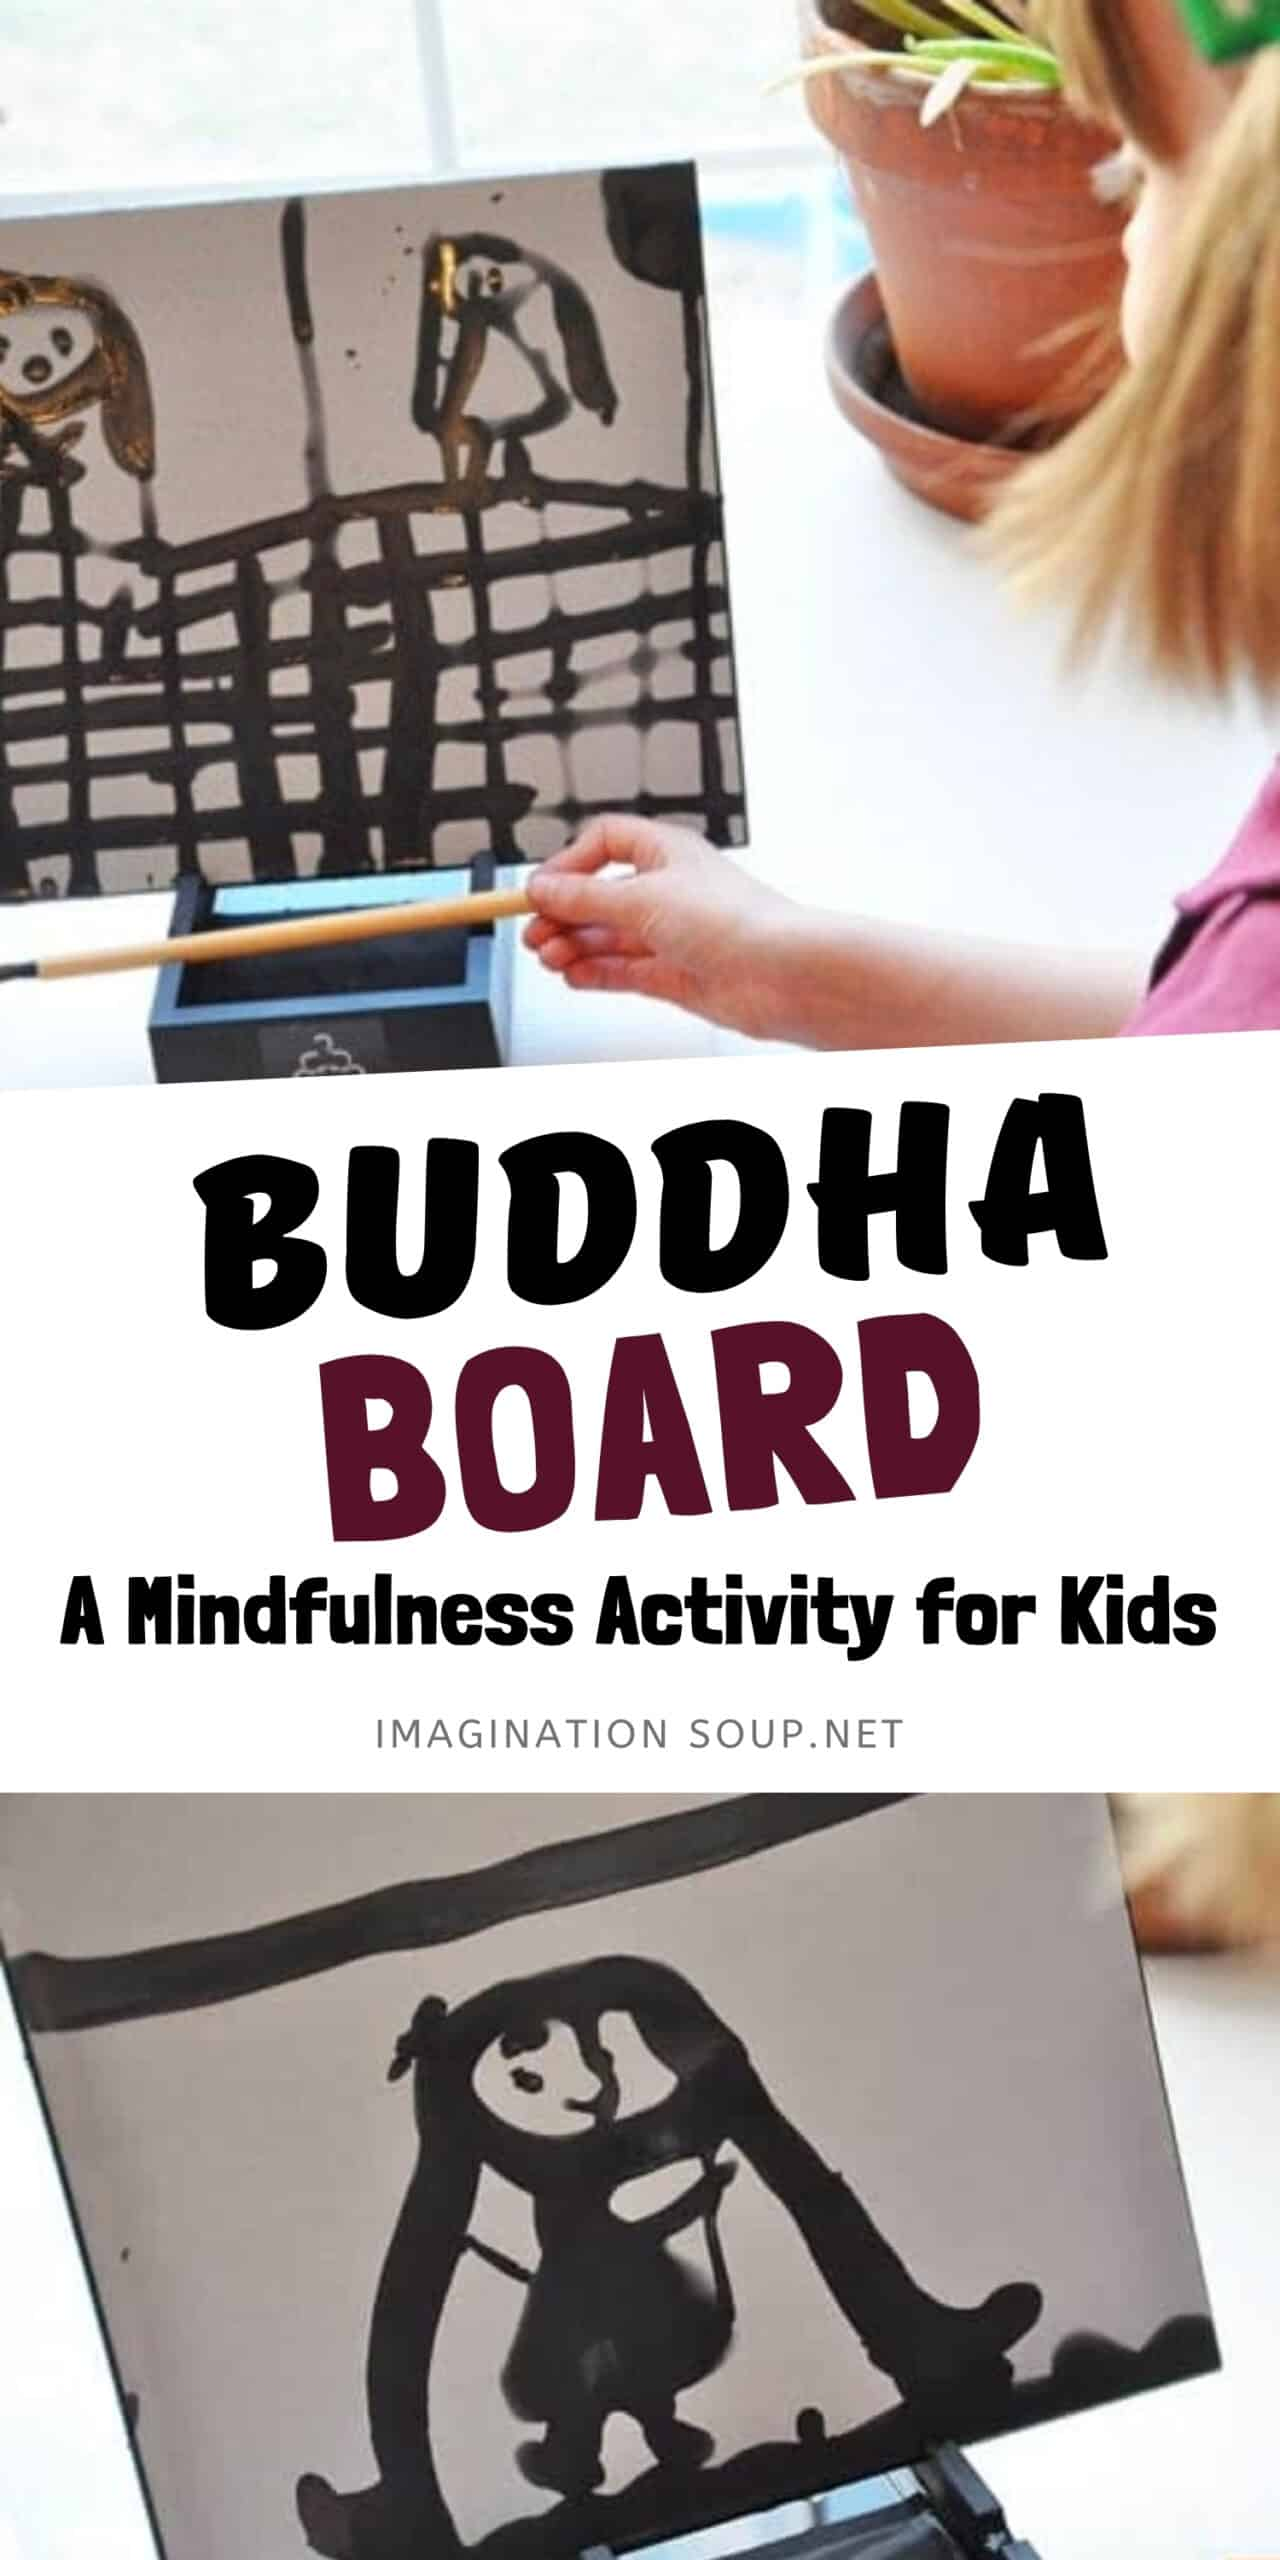 Buddha Board (A Mindfulness Activity for Kids)